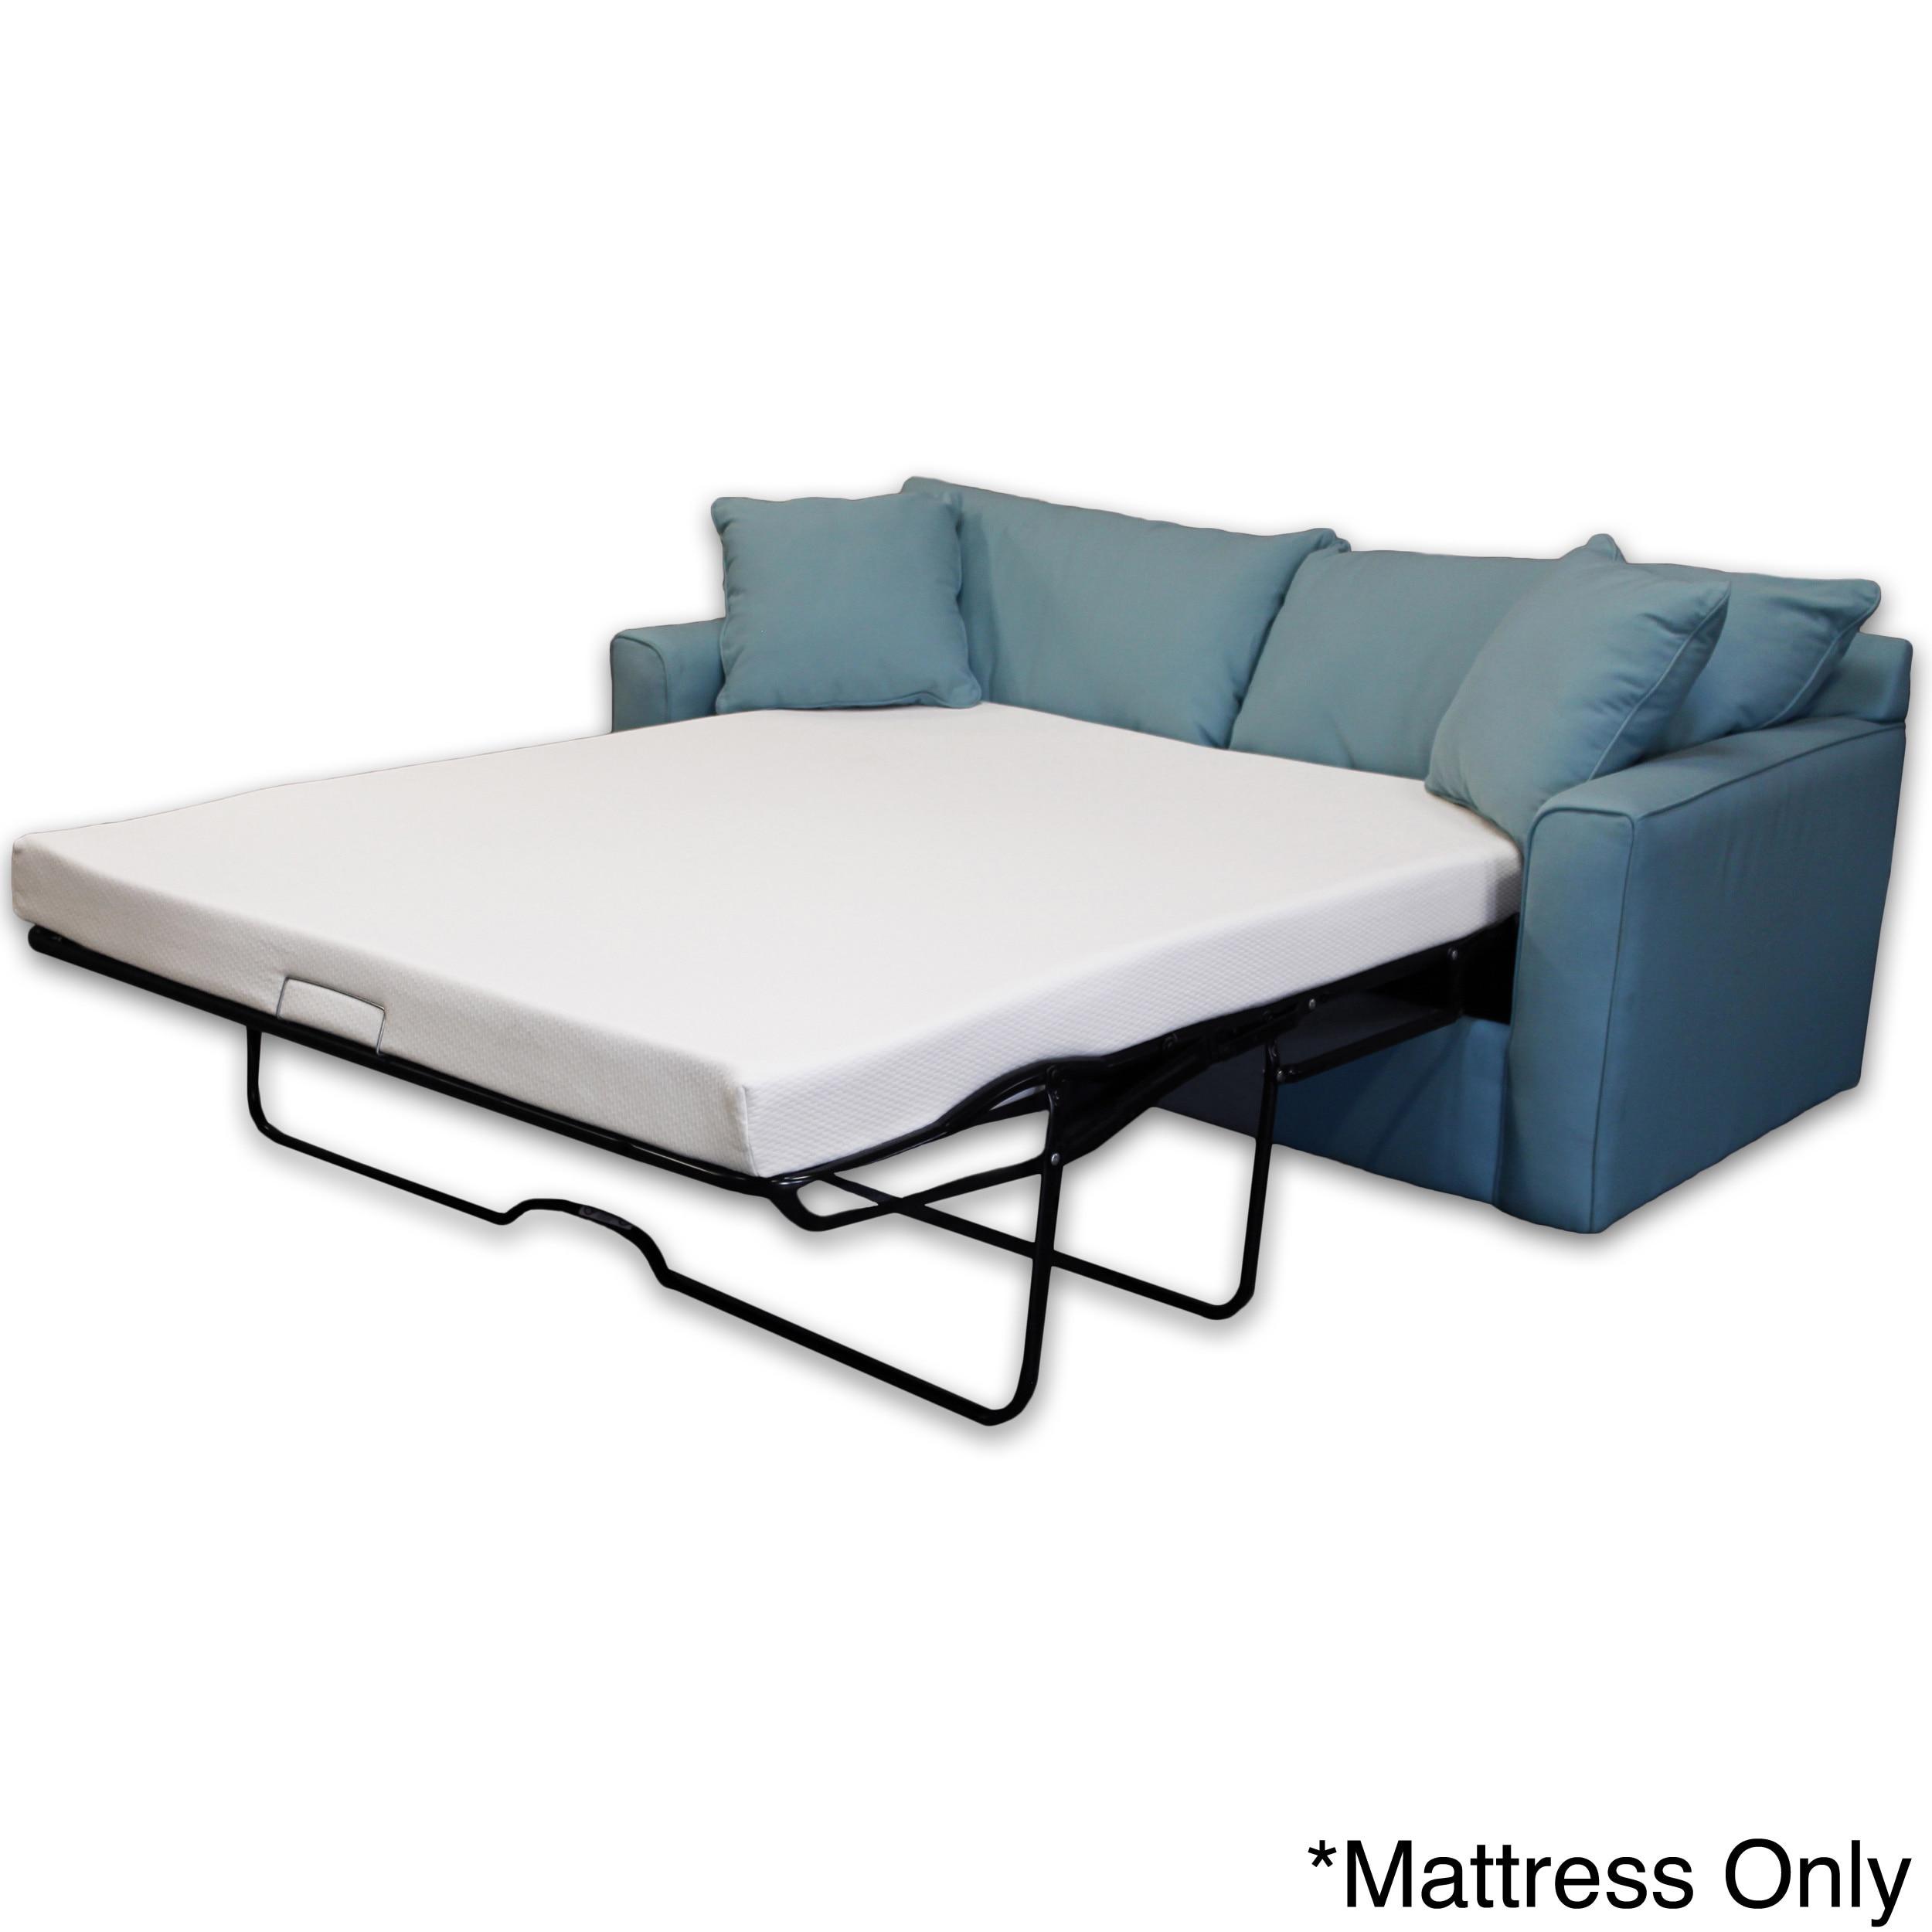 Select Luxury E.C.O. Latex 4.5-inch Full-size Sofa Bed Sleeper Mattress  (Mattress Only)